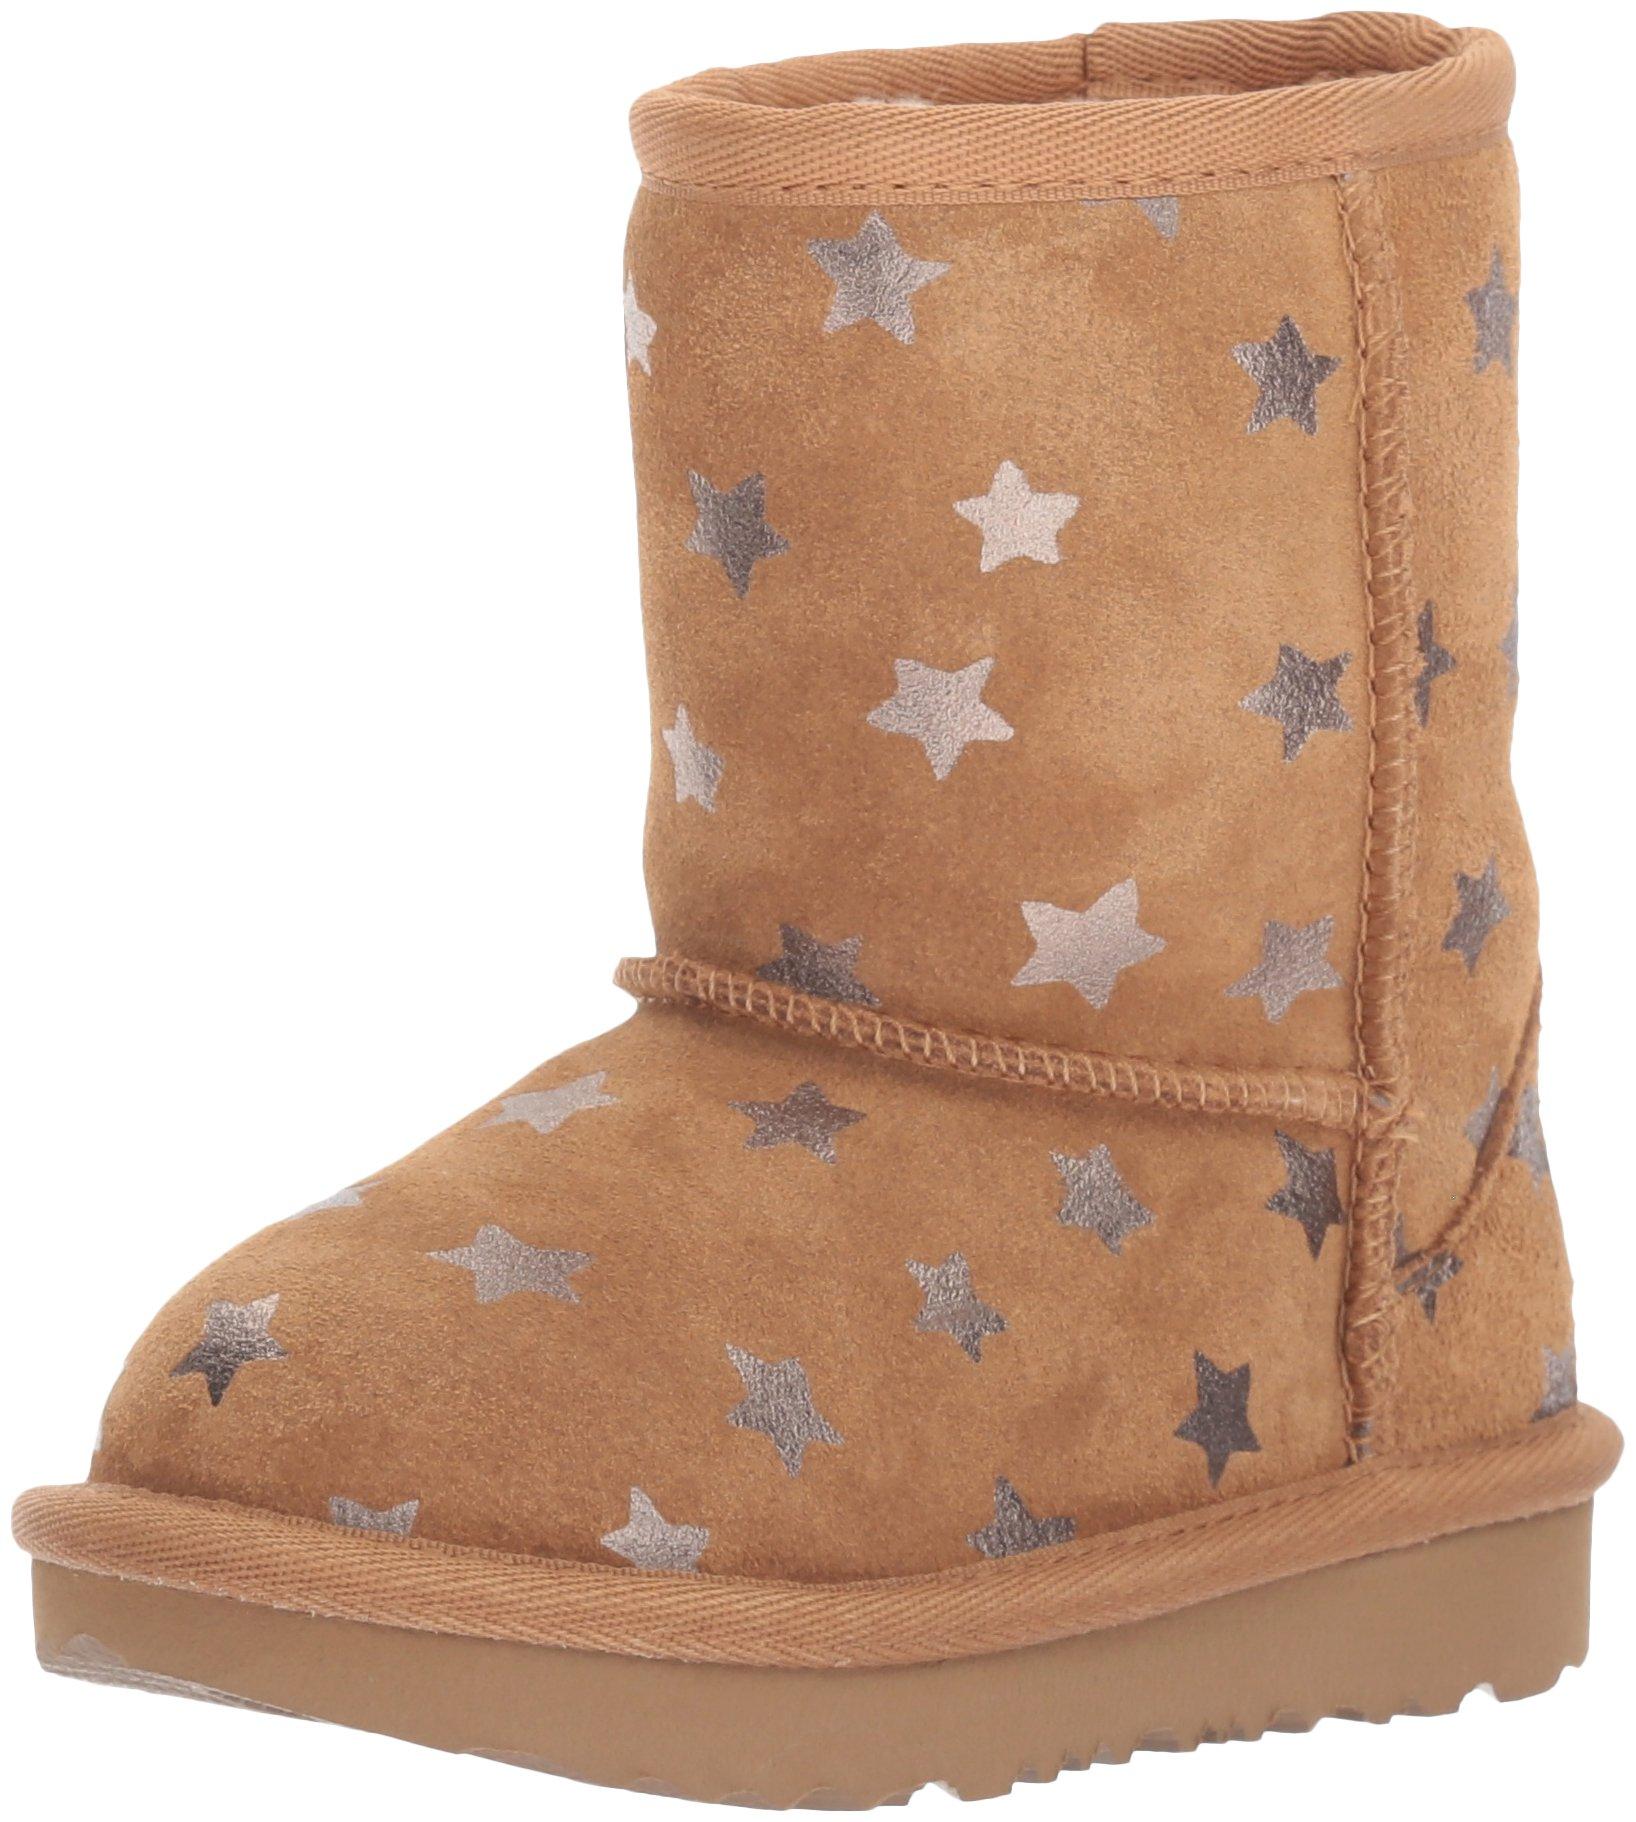 UGG Girls T Classic Short II Stars Pull-On Boot, Chestnut, 7 M US Toddler